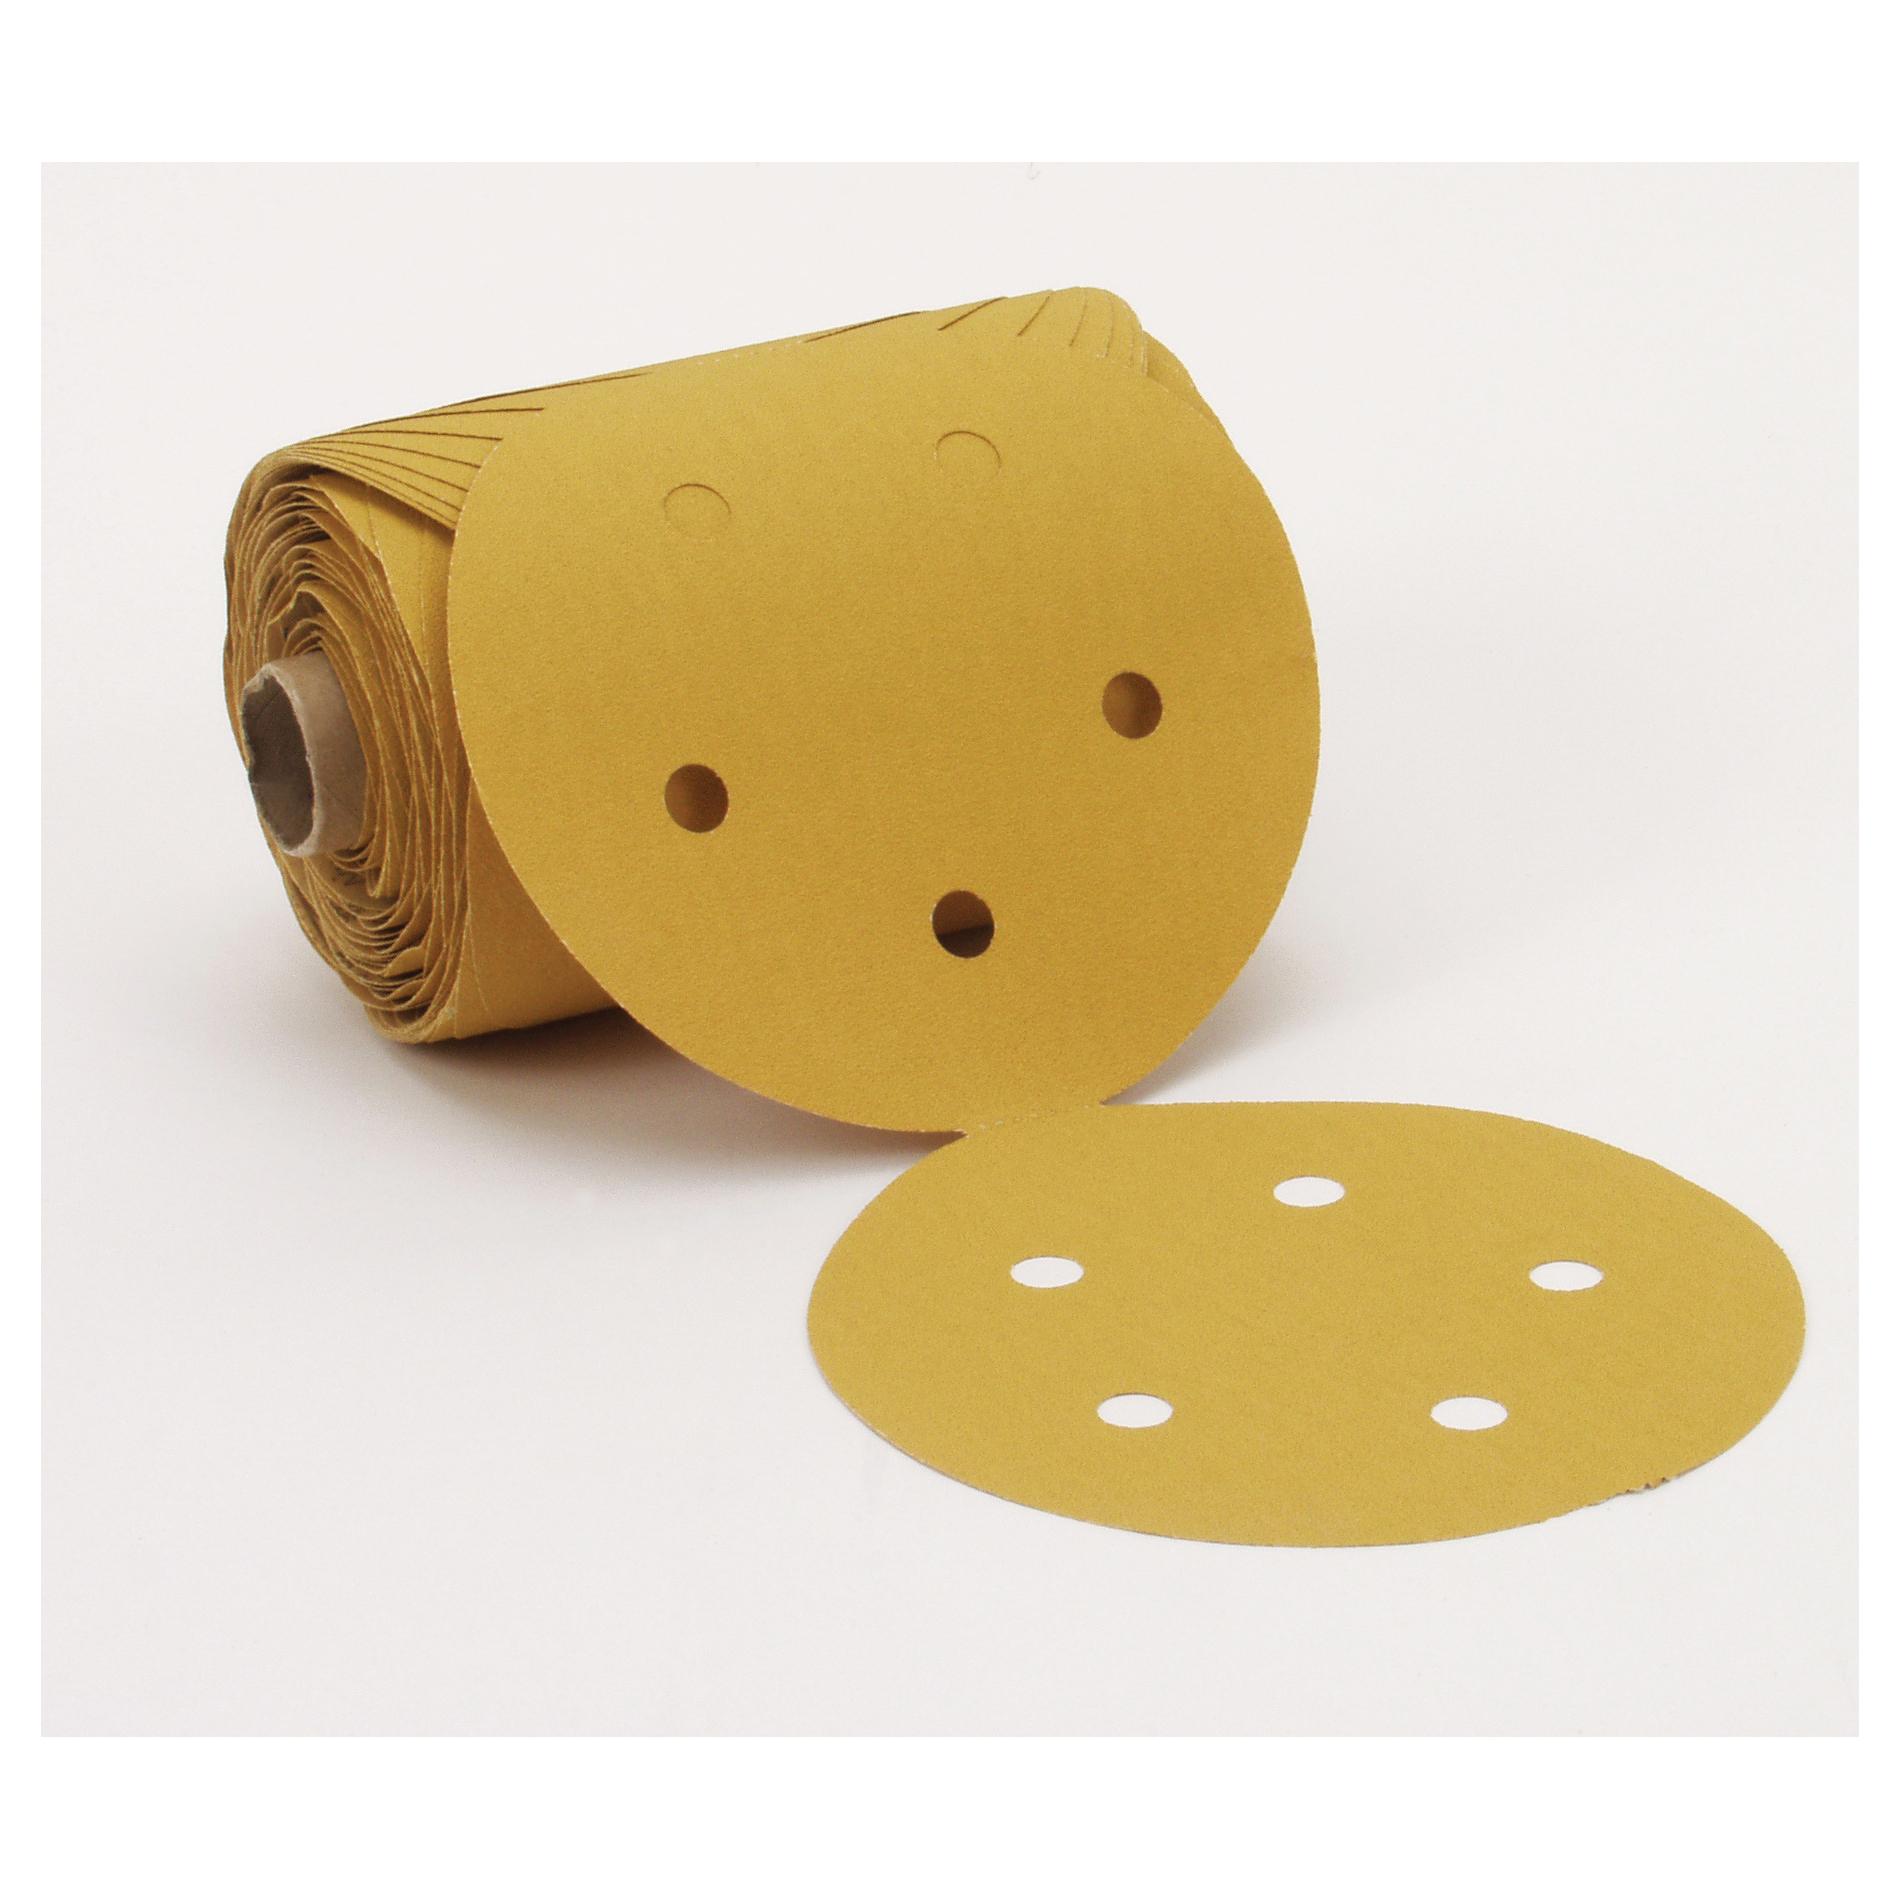 Stikit™ 051144-13669 Closed Coated PSA Abrasive Disc Roll, 5 in Dia, P120 Grit, Fine Grade, Aluminum Oxide Abrasive, Paper Backing